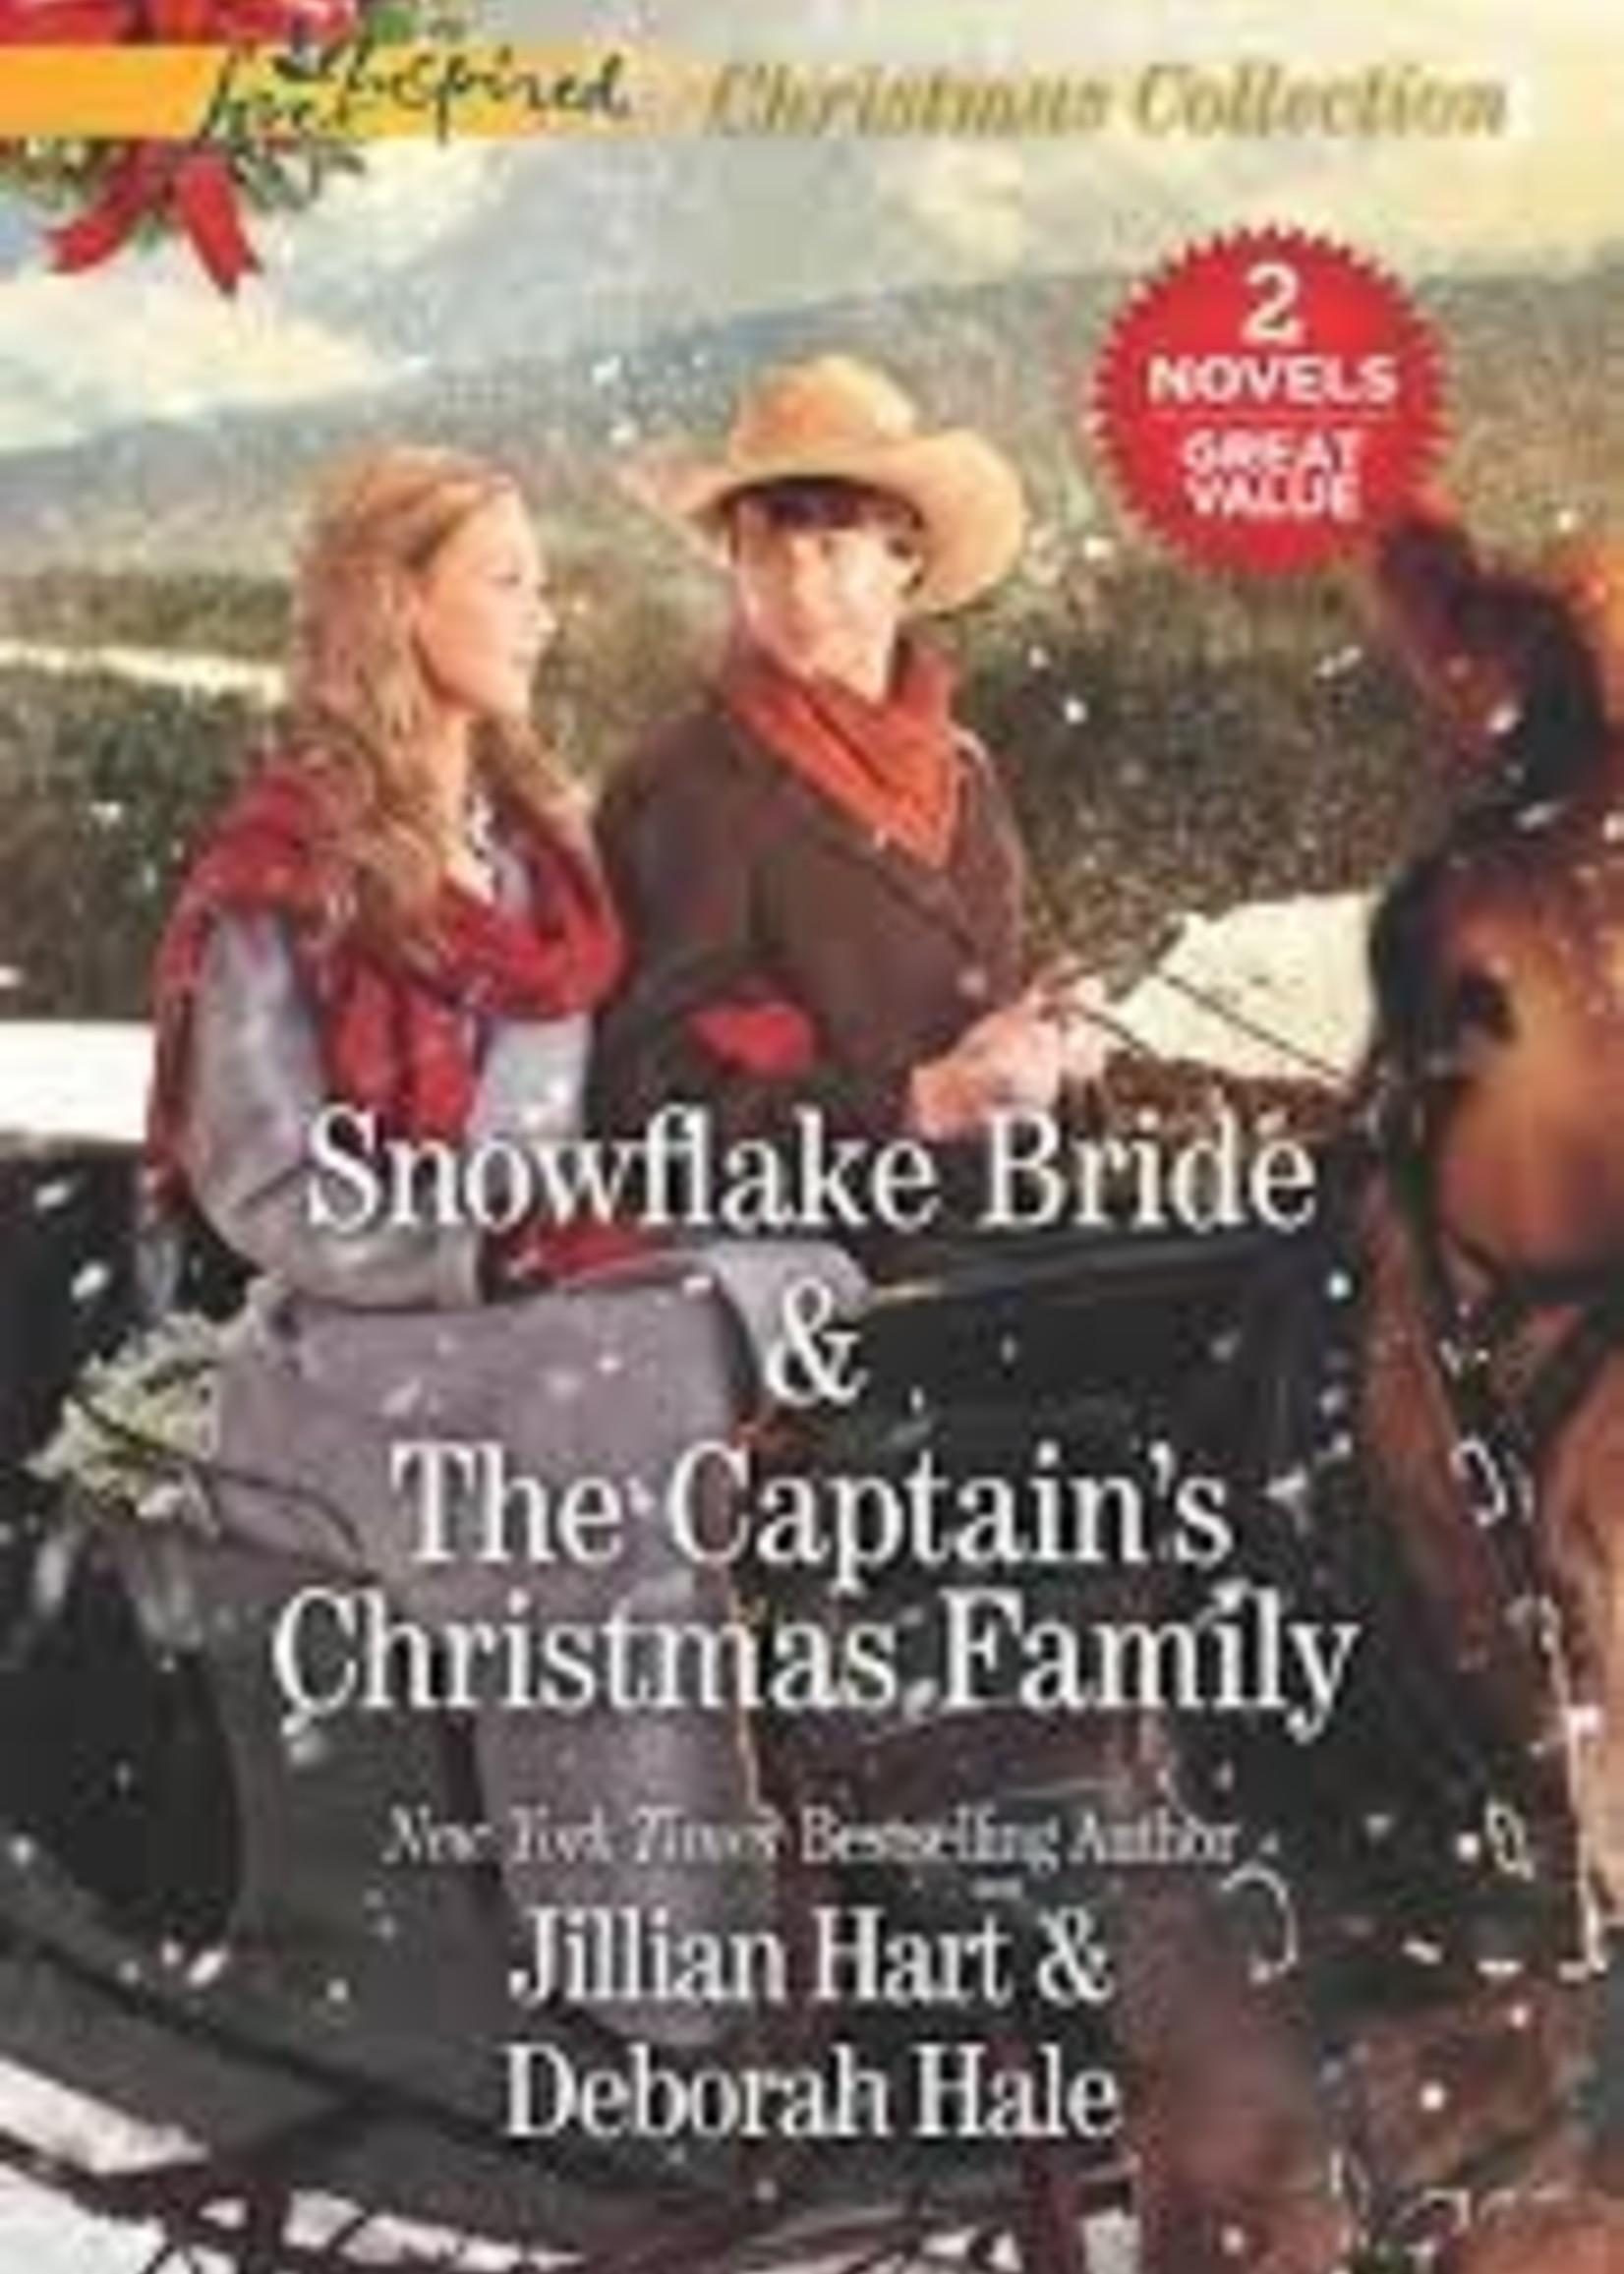 Snowflake Bride & The Captain's Christmas Family by Jillian Hart & Deborah Hale